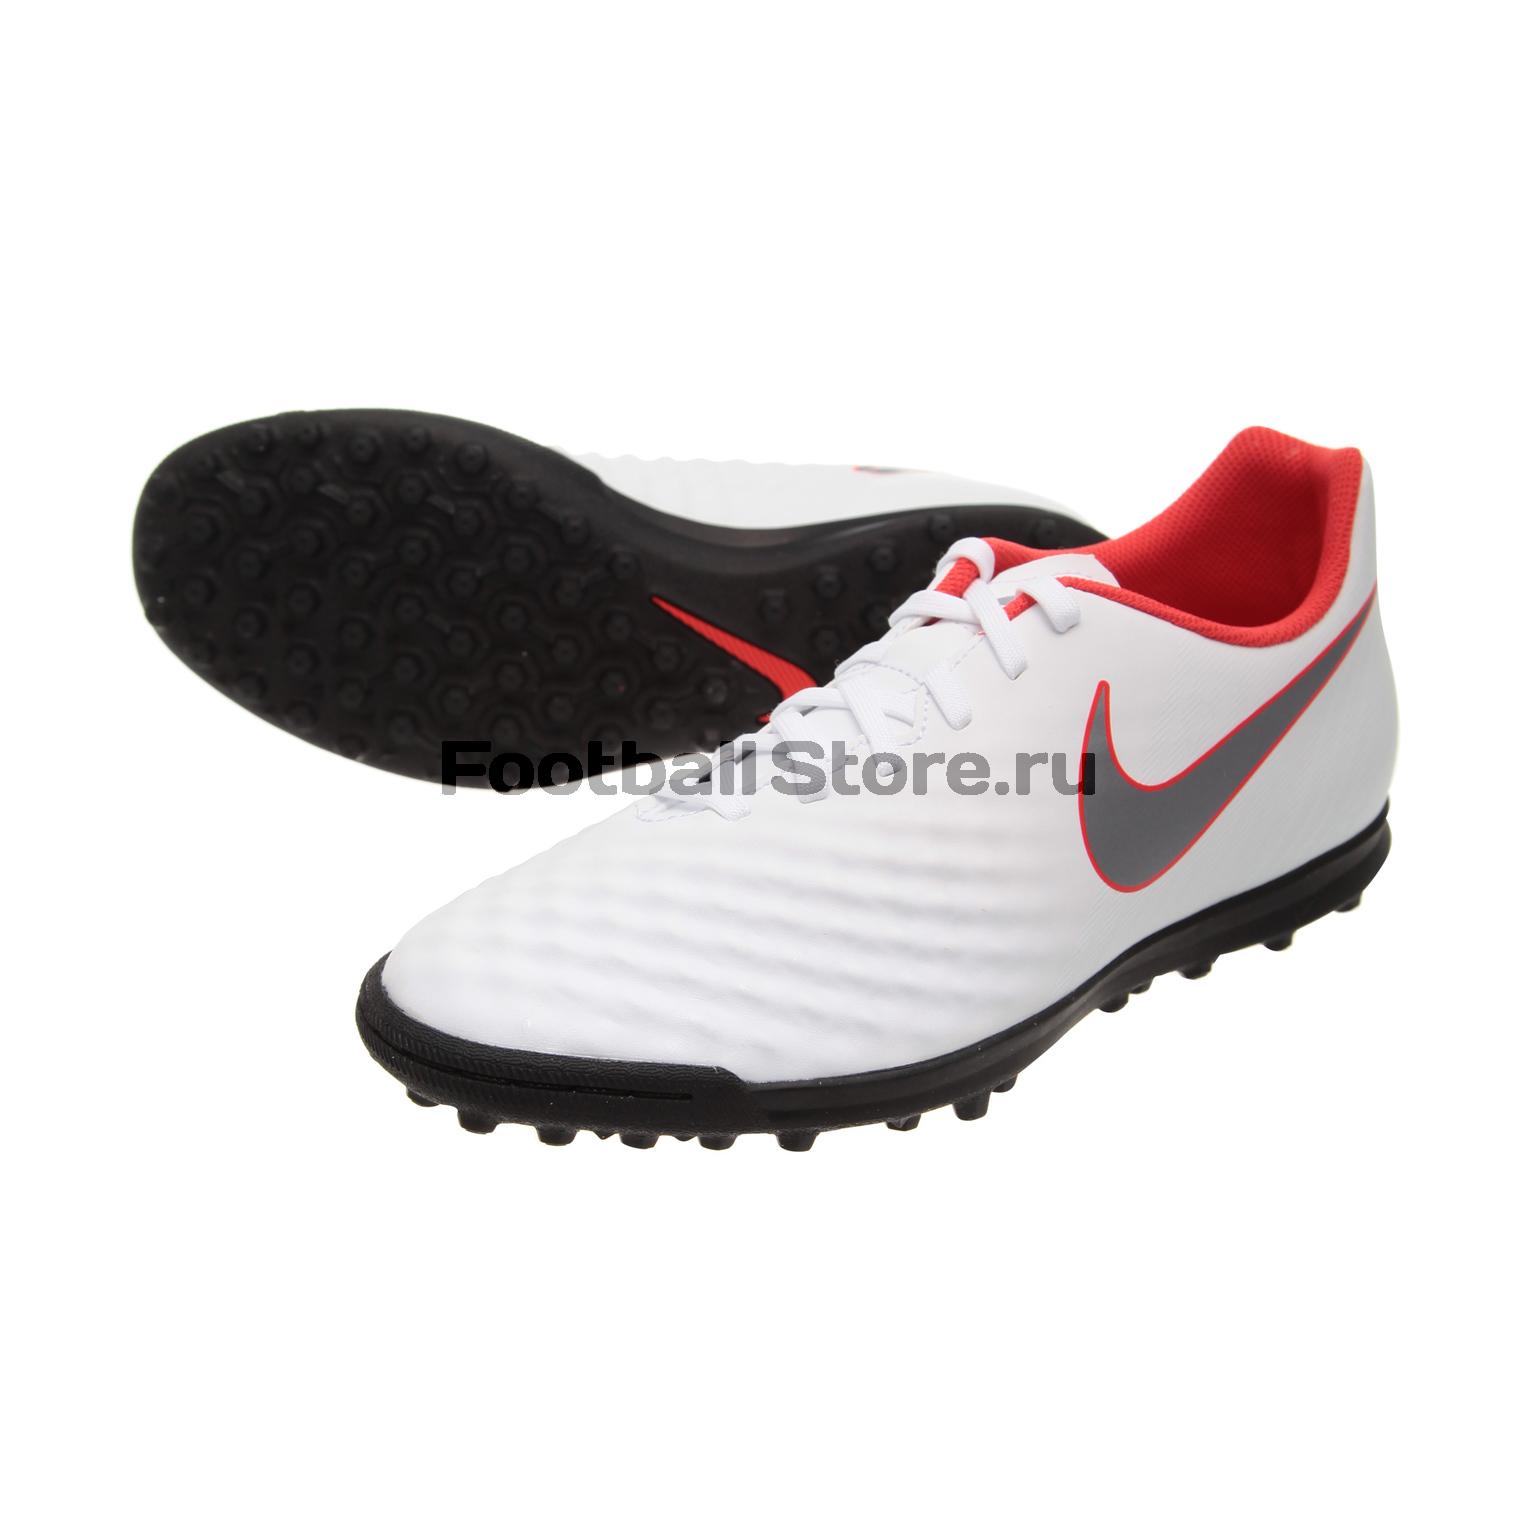 Шиповки Nike ObraX 2 Club TF AH7312-107 шиповки nike legendx 7 club tf ah7248 107